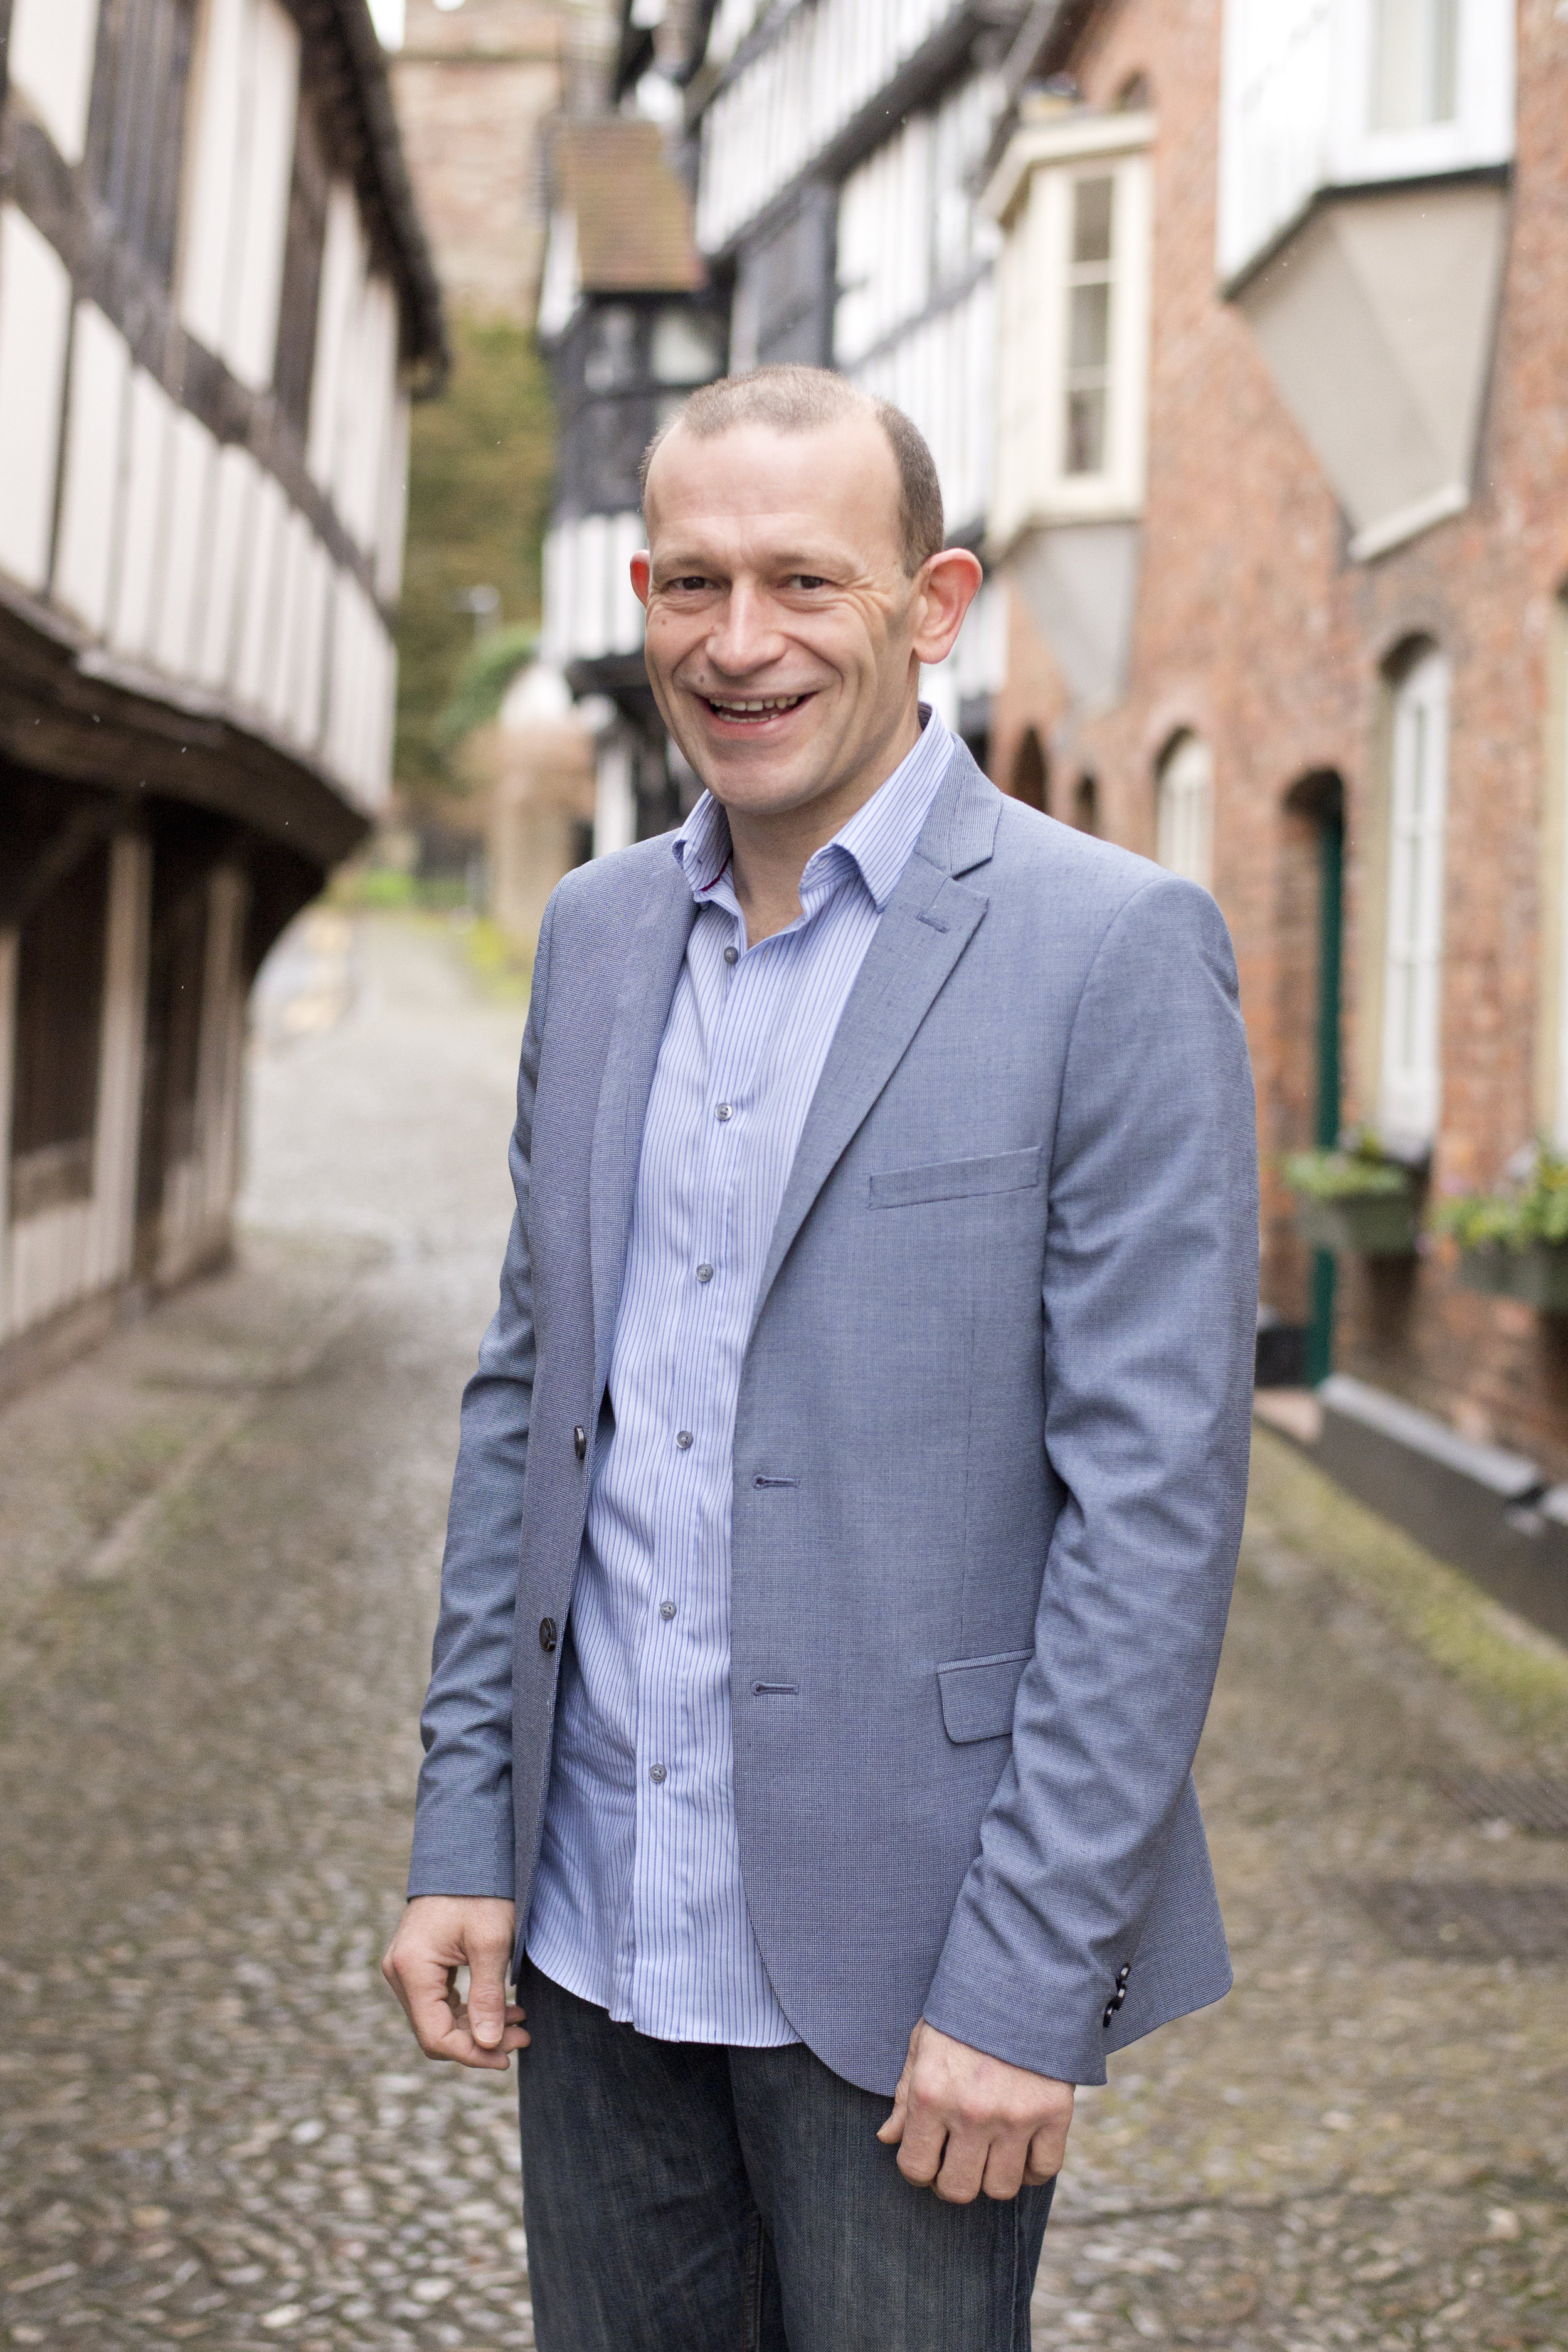 Paul Holmes ShelleyHolmes Accountancy Limited- Ledbury